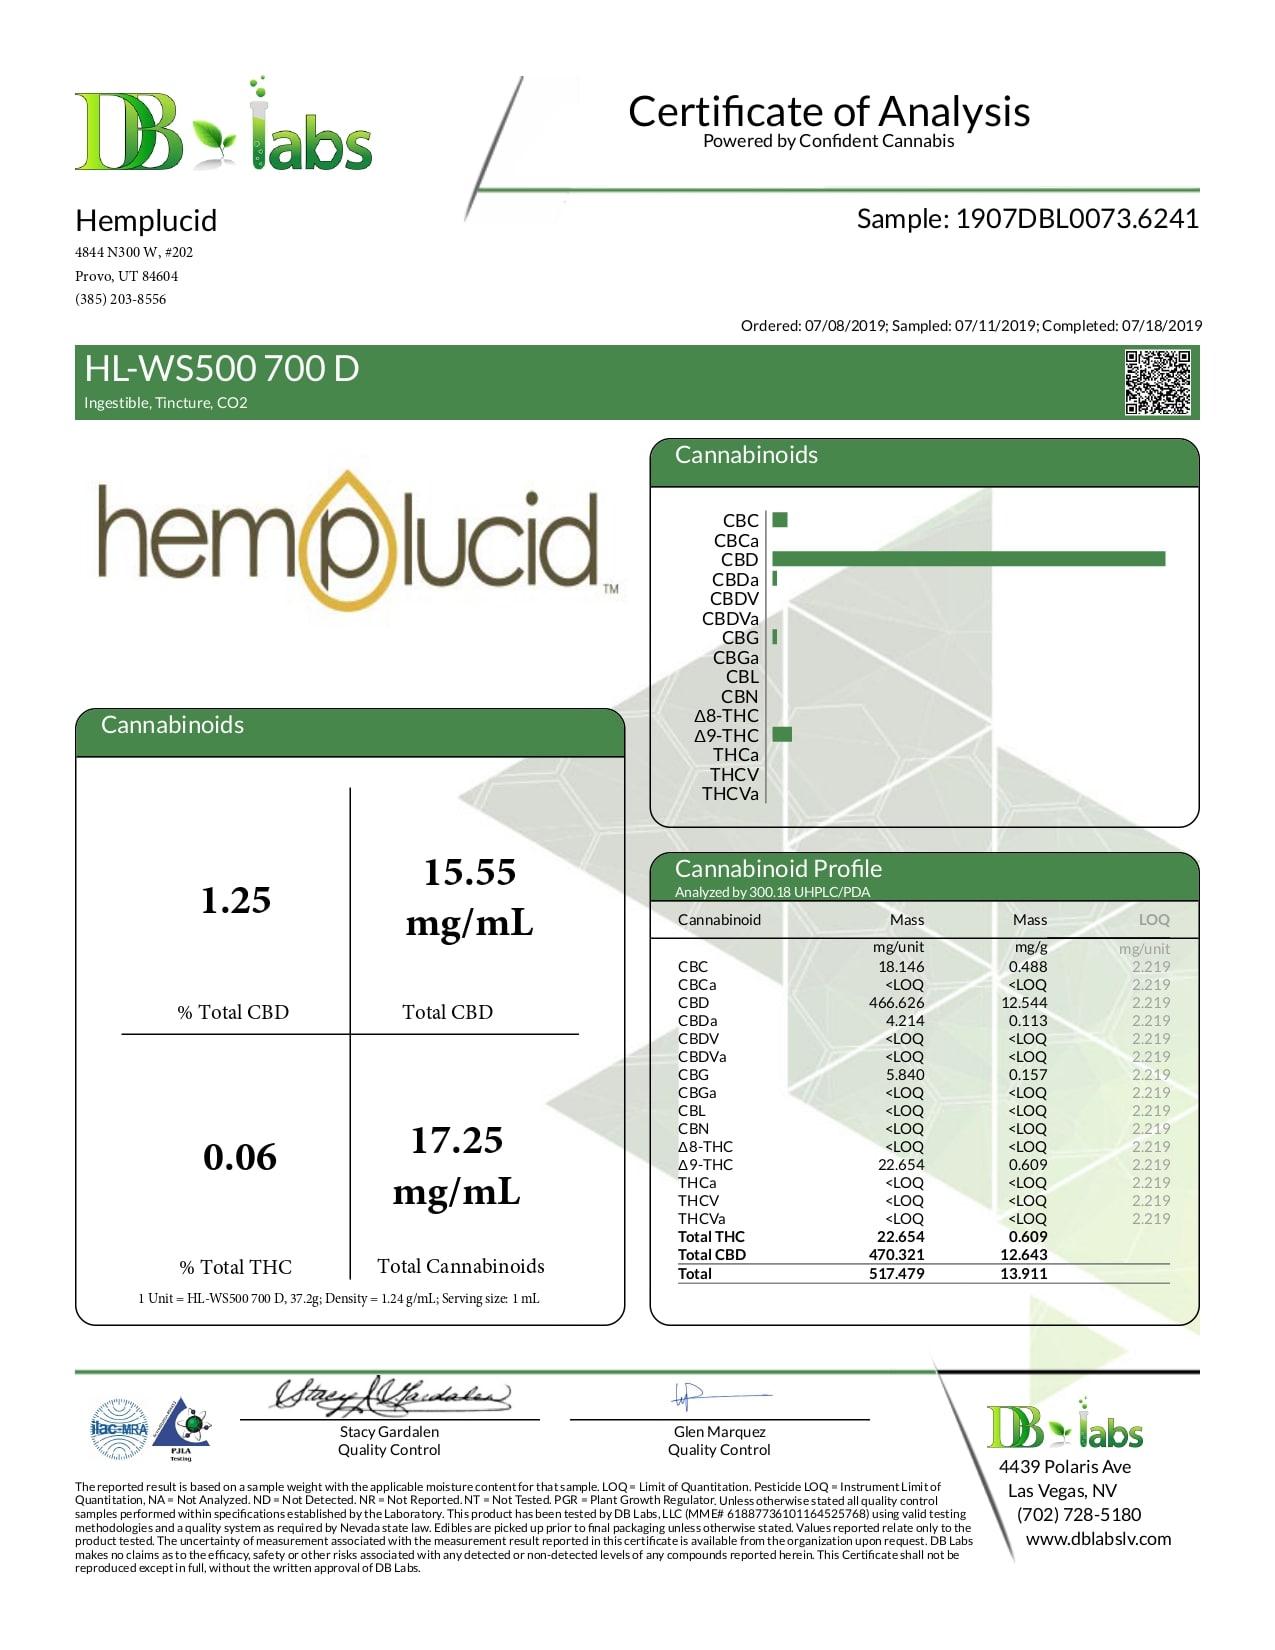 Hemplucid Full Spectrum CBD Water Soluble 500mg Lab Report